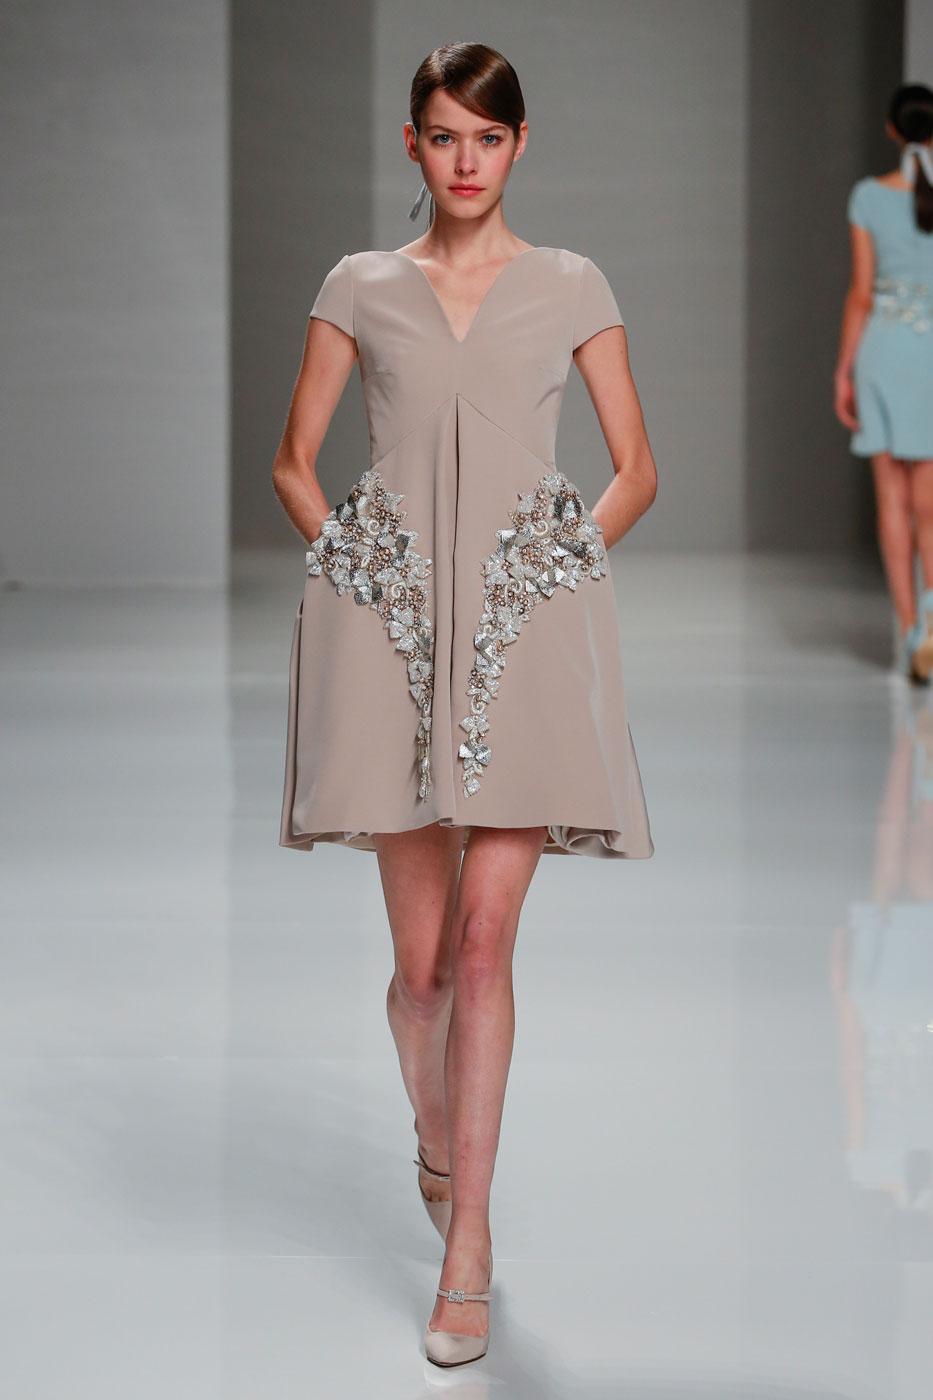 Georges-Hobeika-fashion-runway-show-haute-couture-paris-spring-2015-the-impression-29